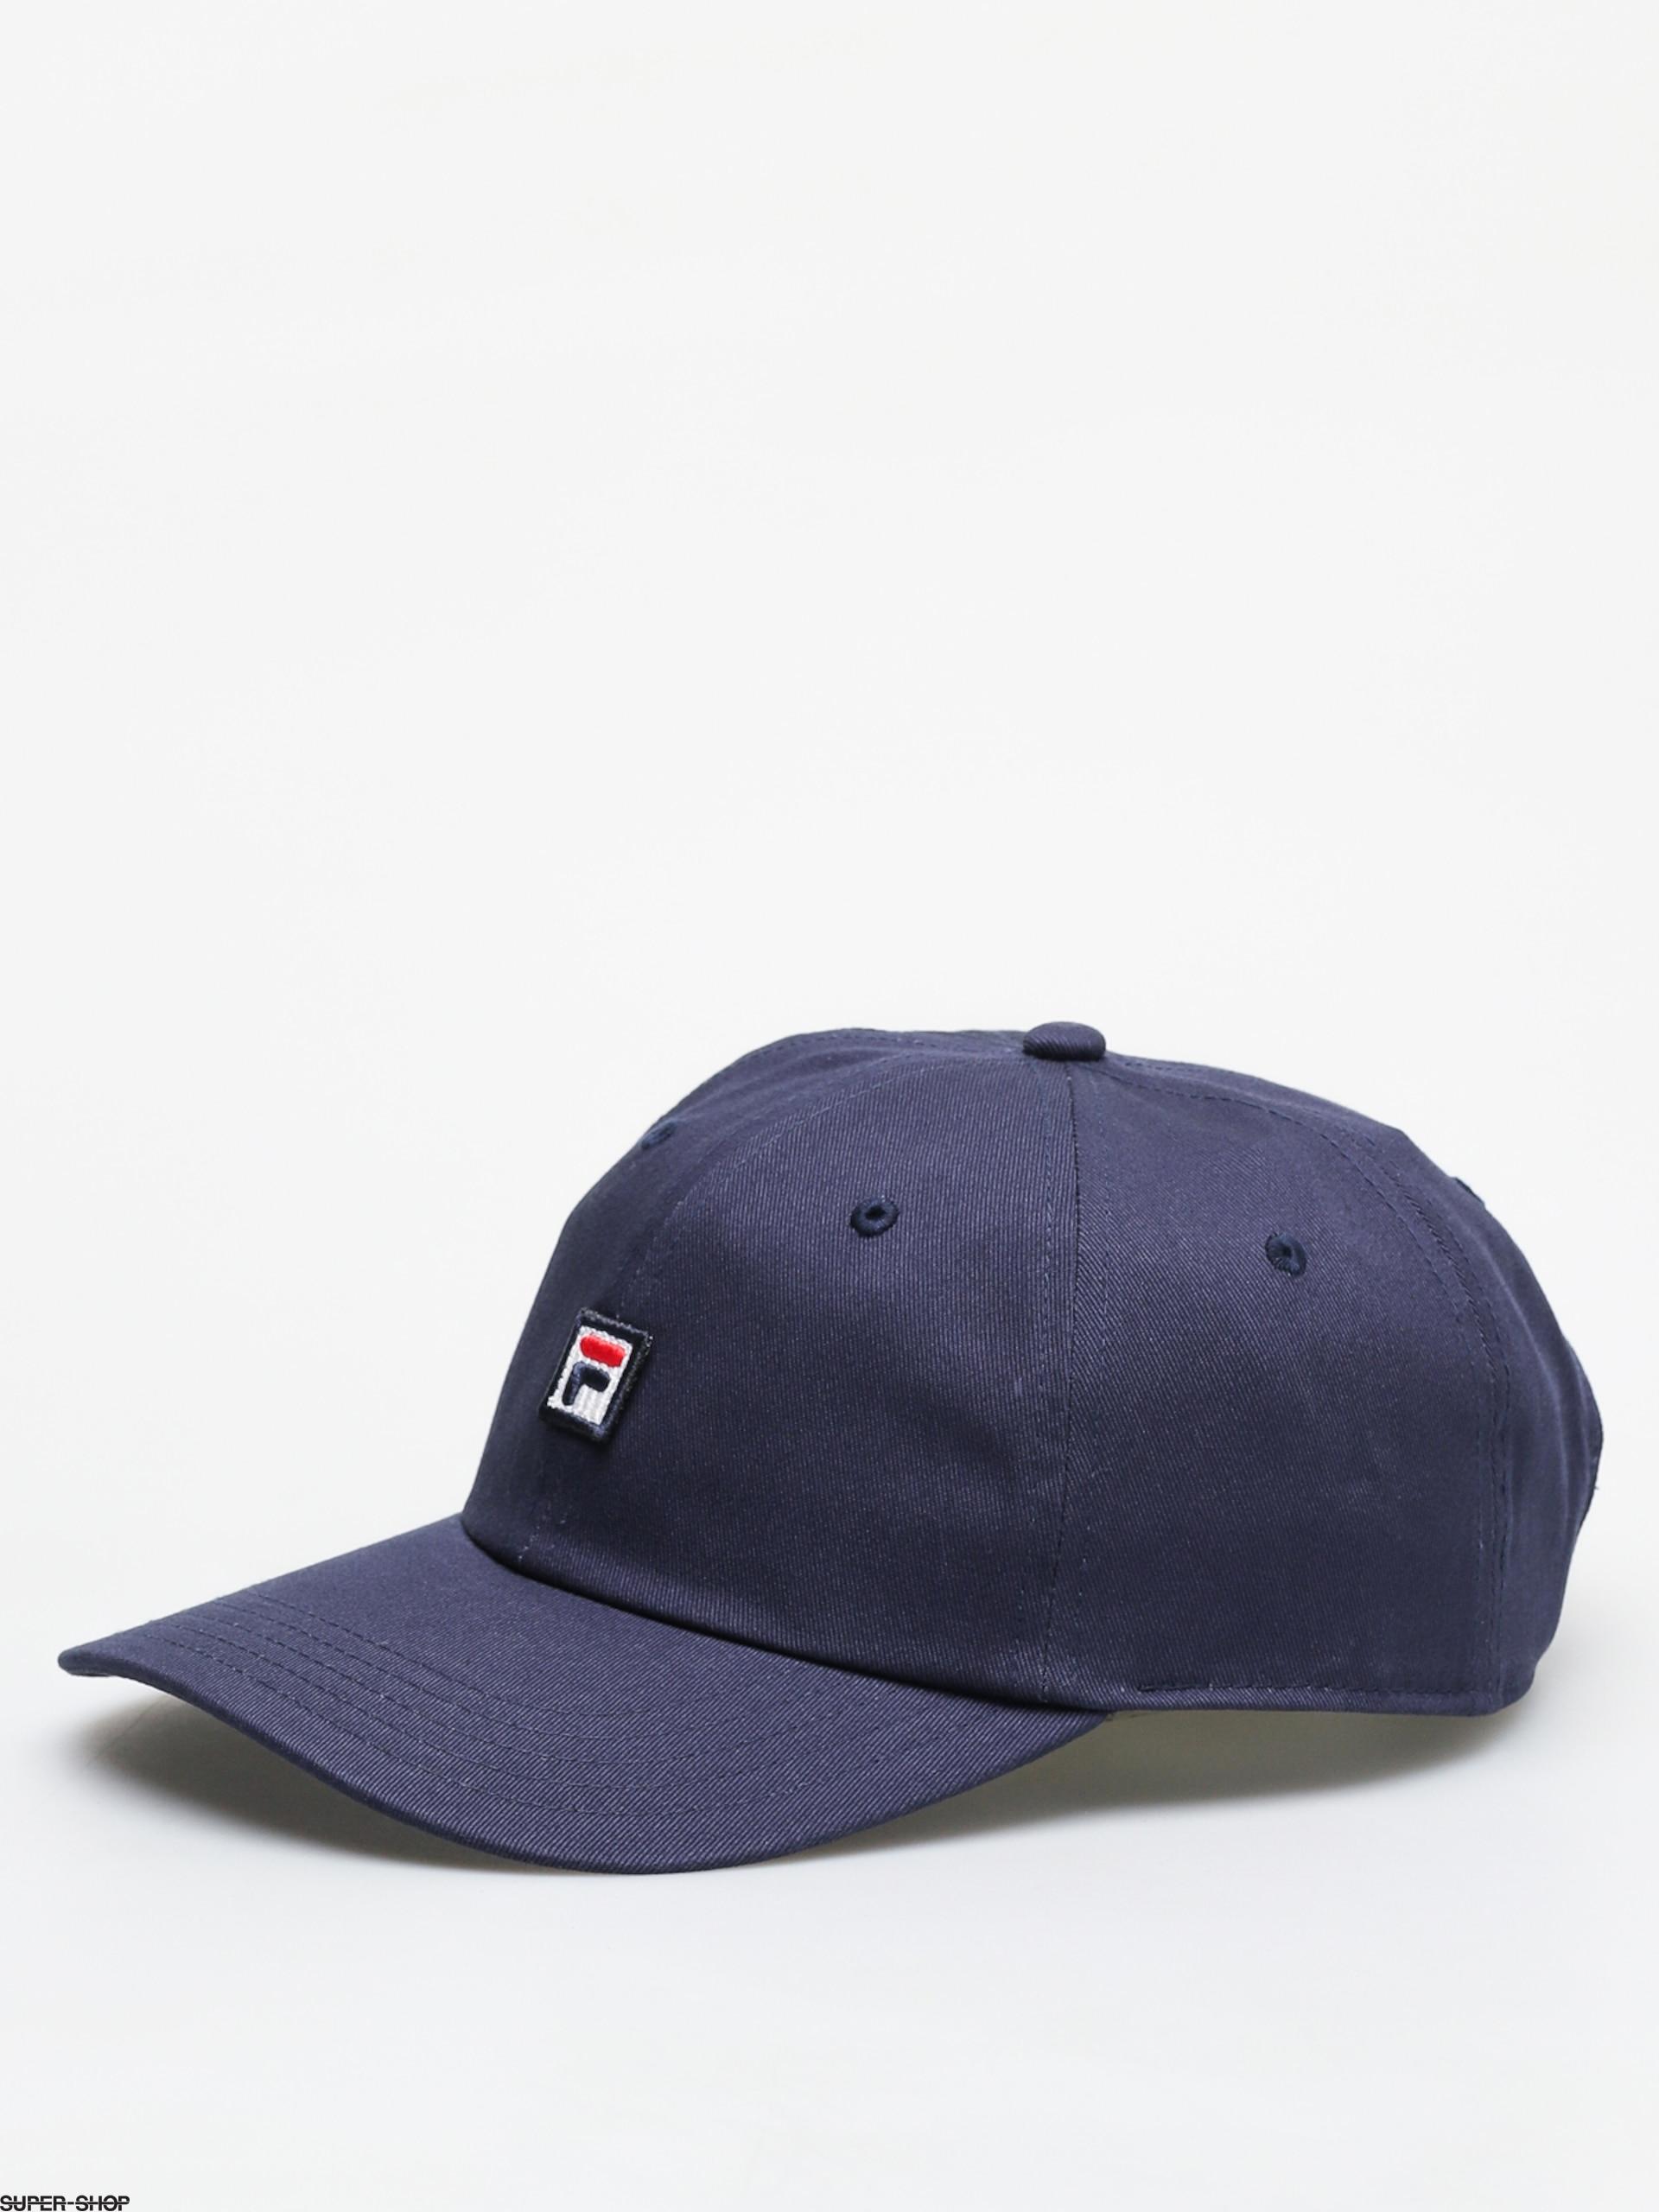 4a61868c87f7 1020945-w1920-fila-dad-cap-zd-cap-black-iris.jpg